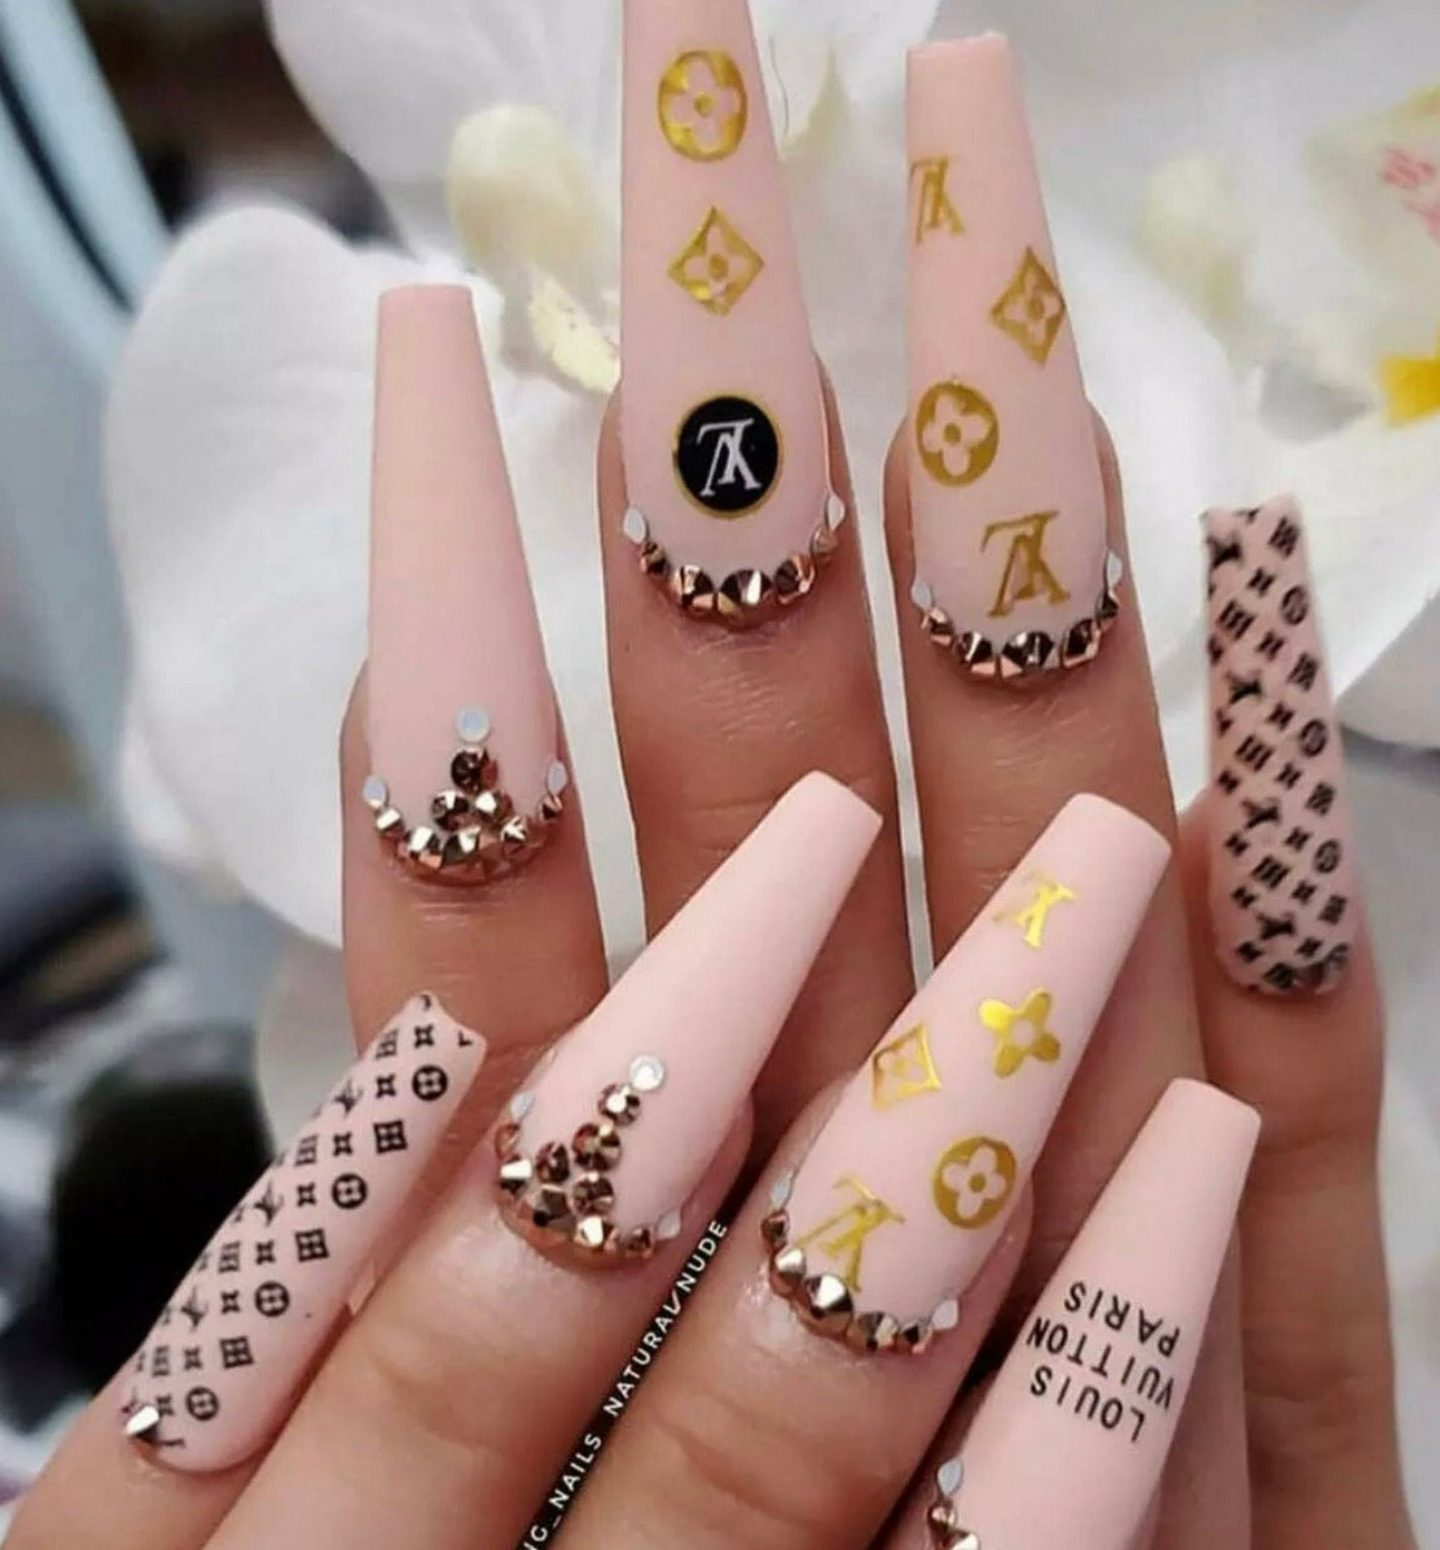 Nude Louis Vuitton coffin nails